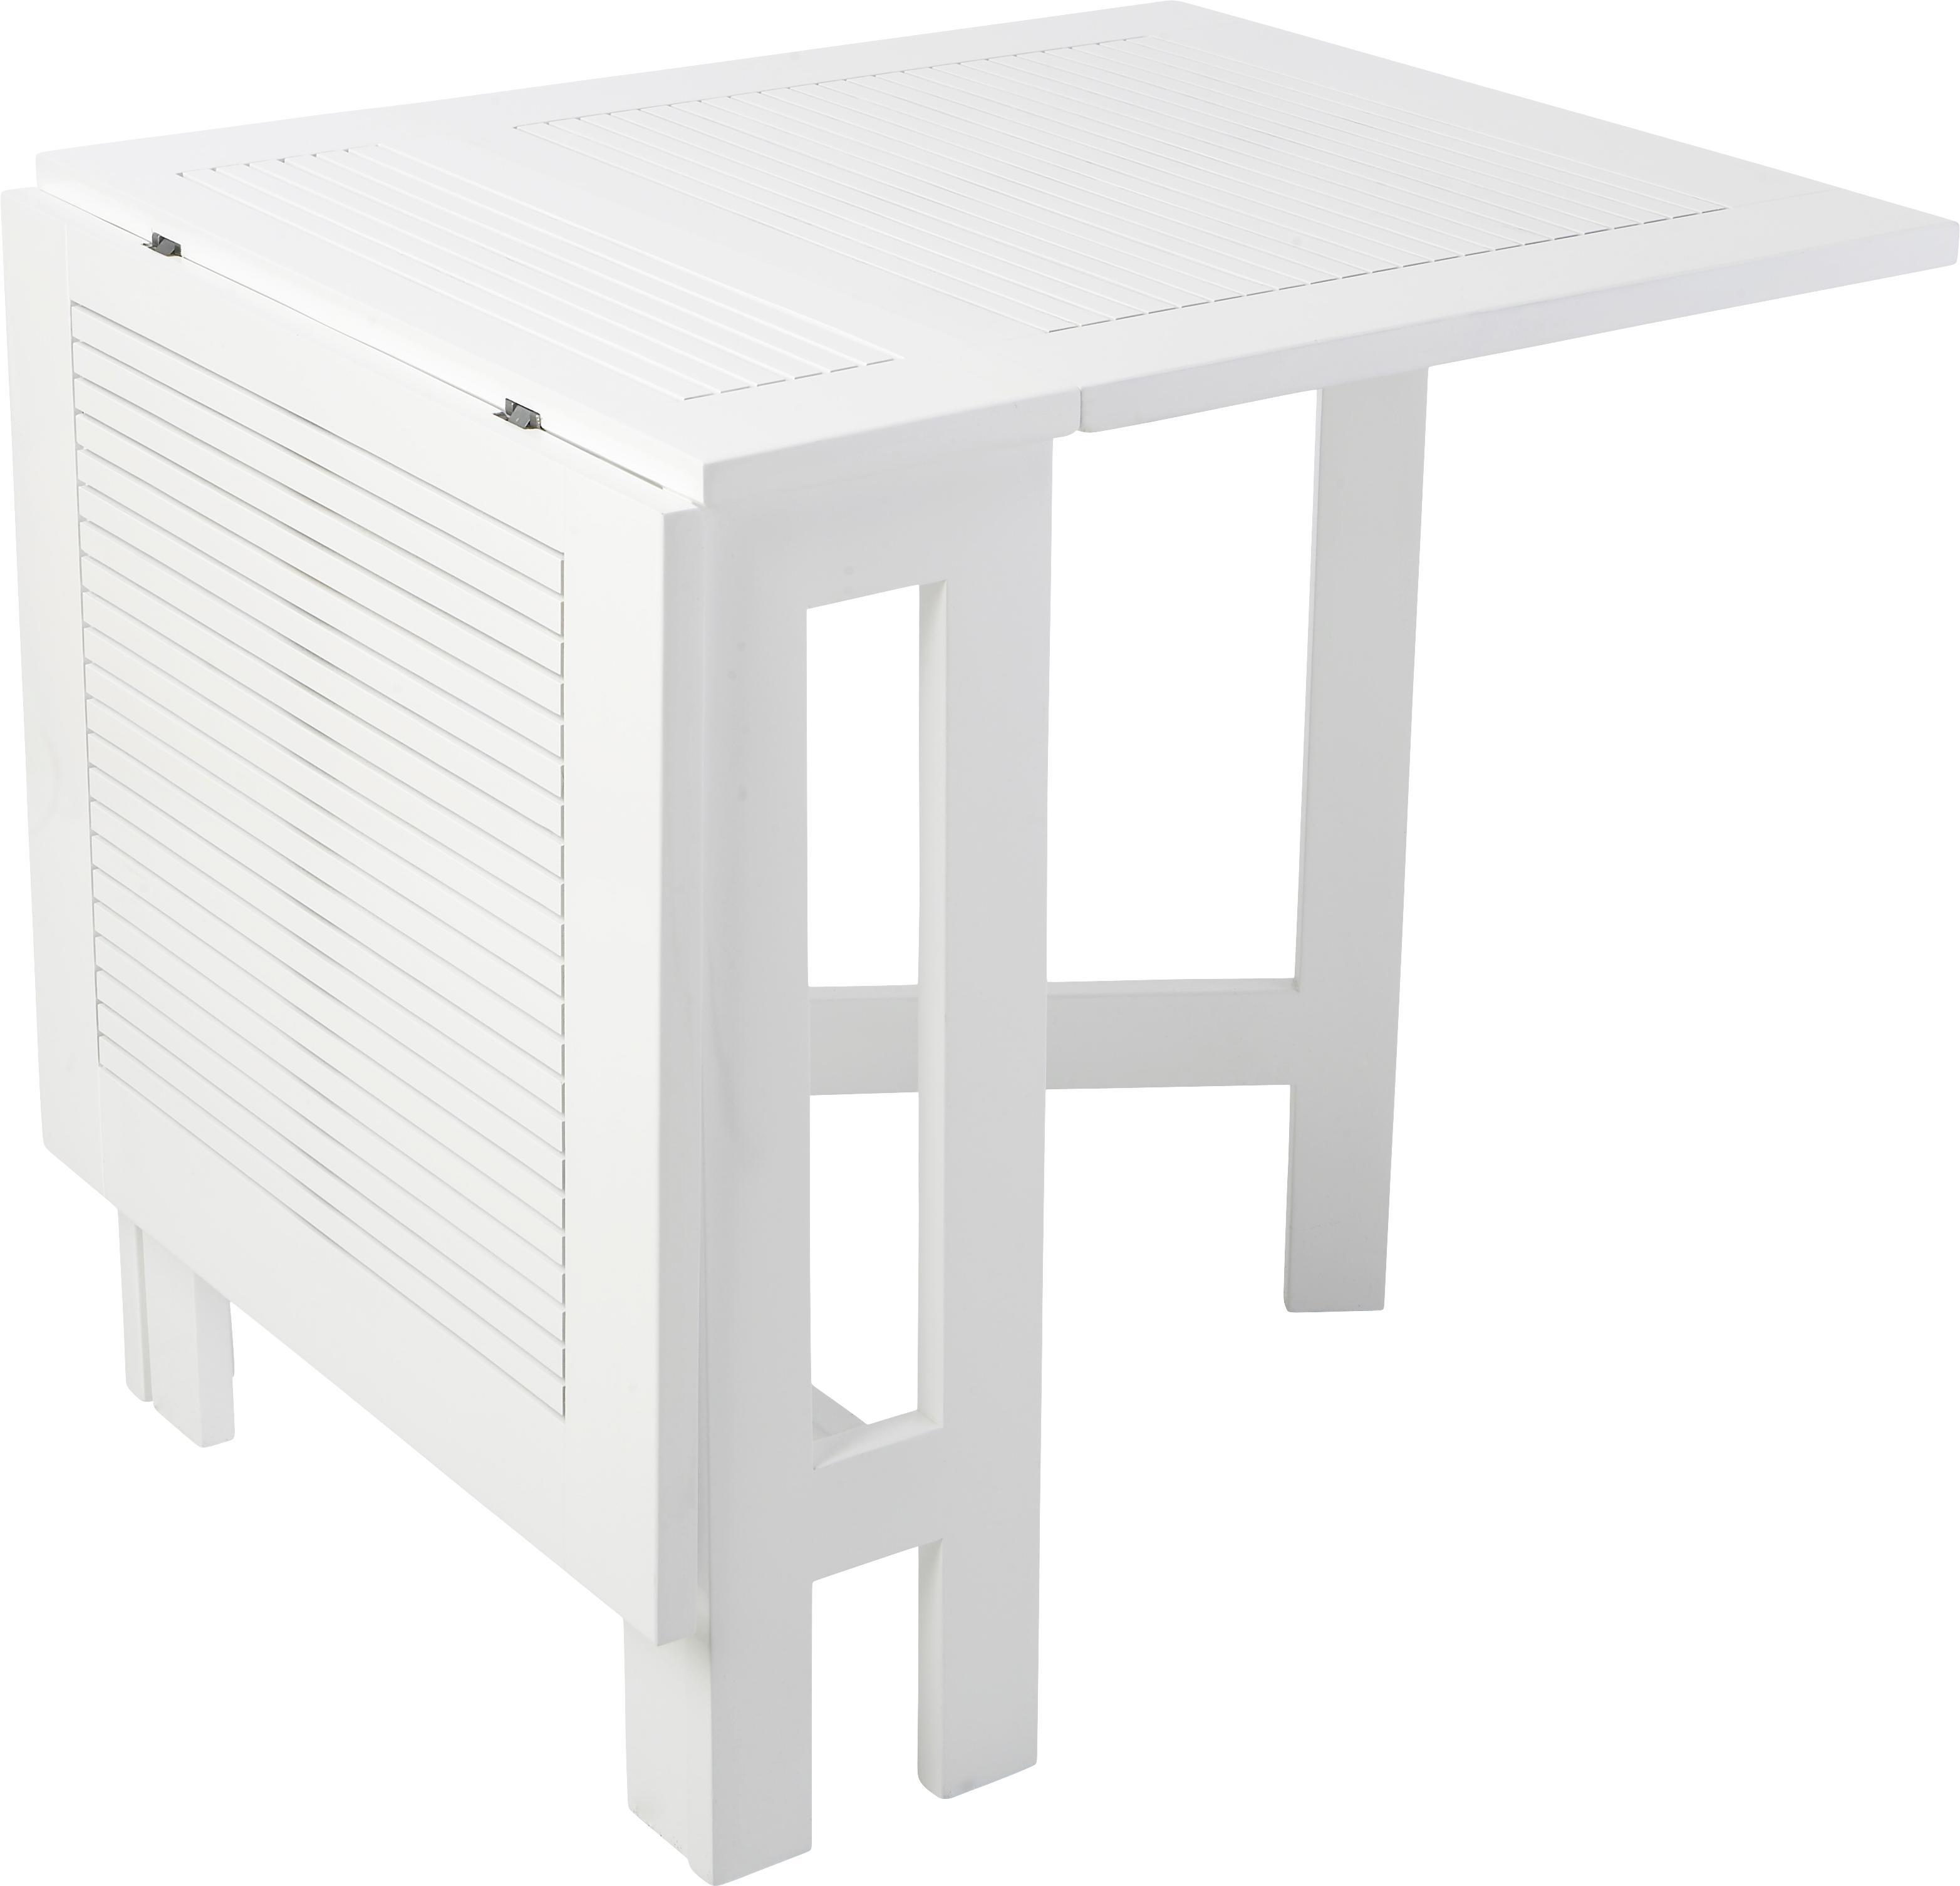 Tavolo pieghevole da balcone Butterfly, Bianco, Larg. 130 x Alt. 72 cm